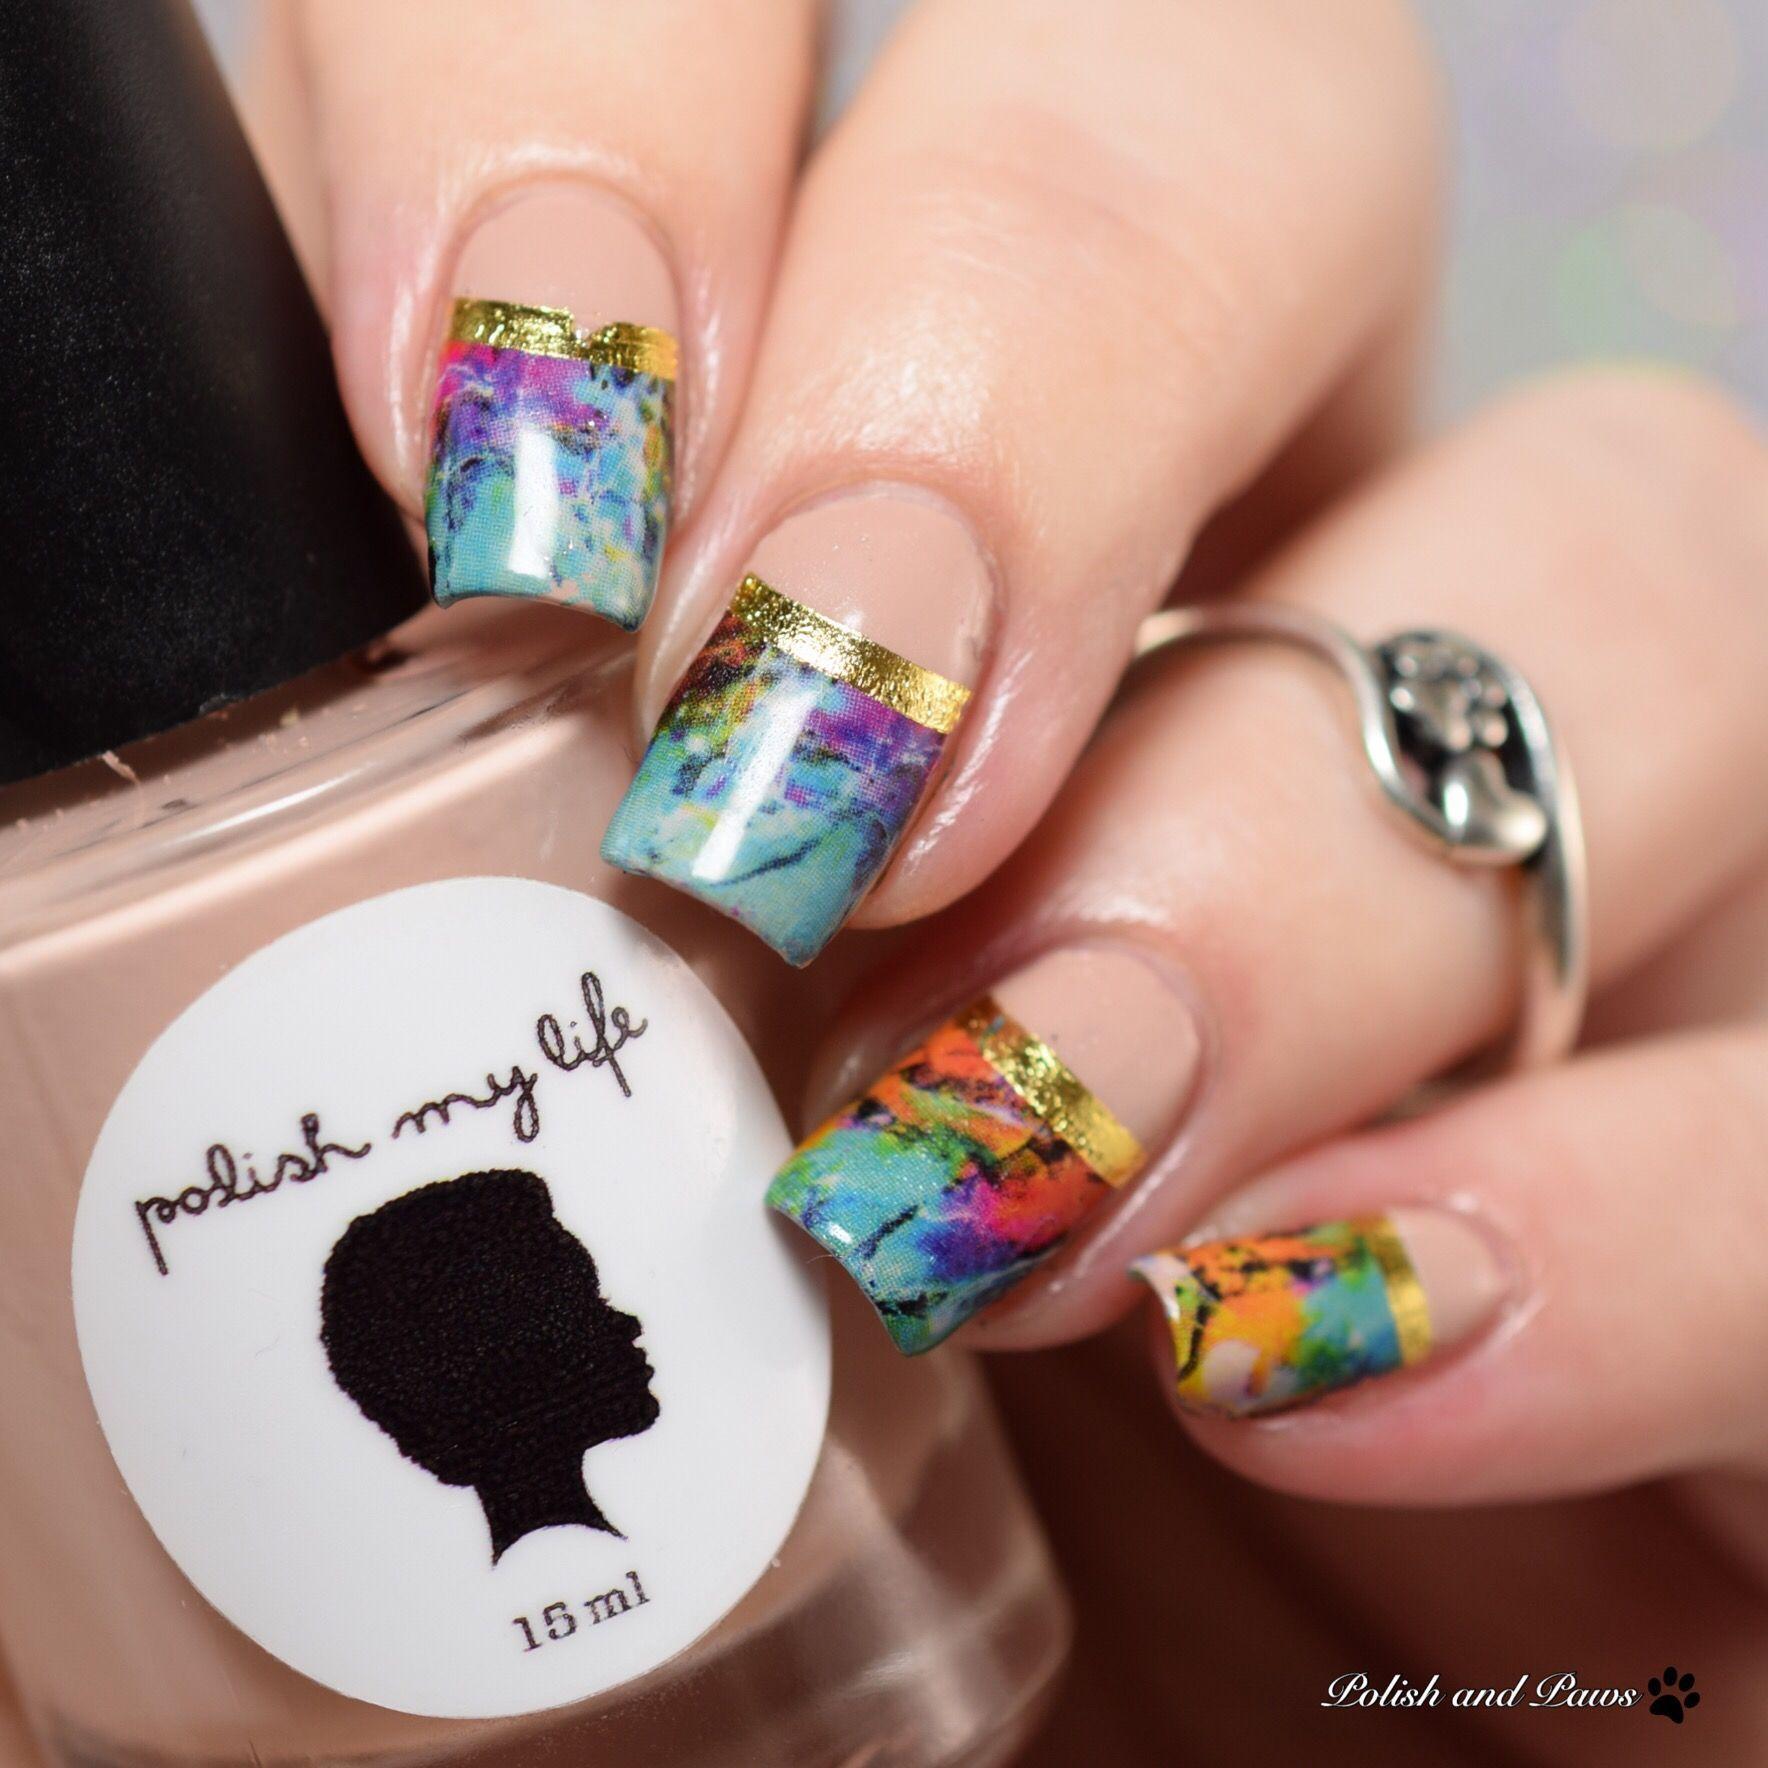 Polish and Paws Nail Art | Re-Pin Nail Exchange | Pinterest